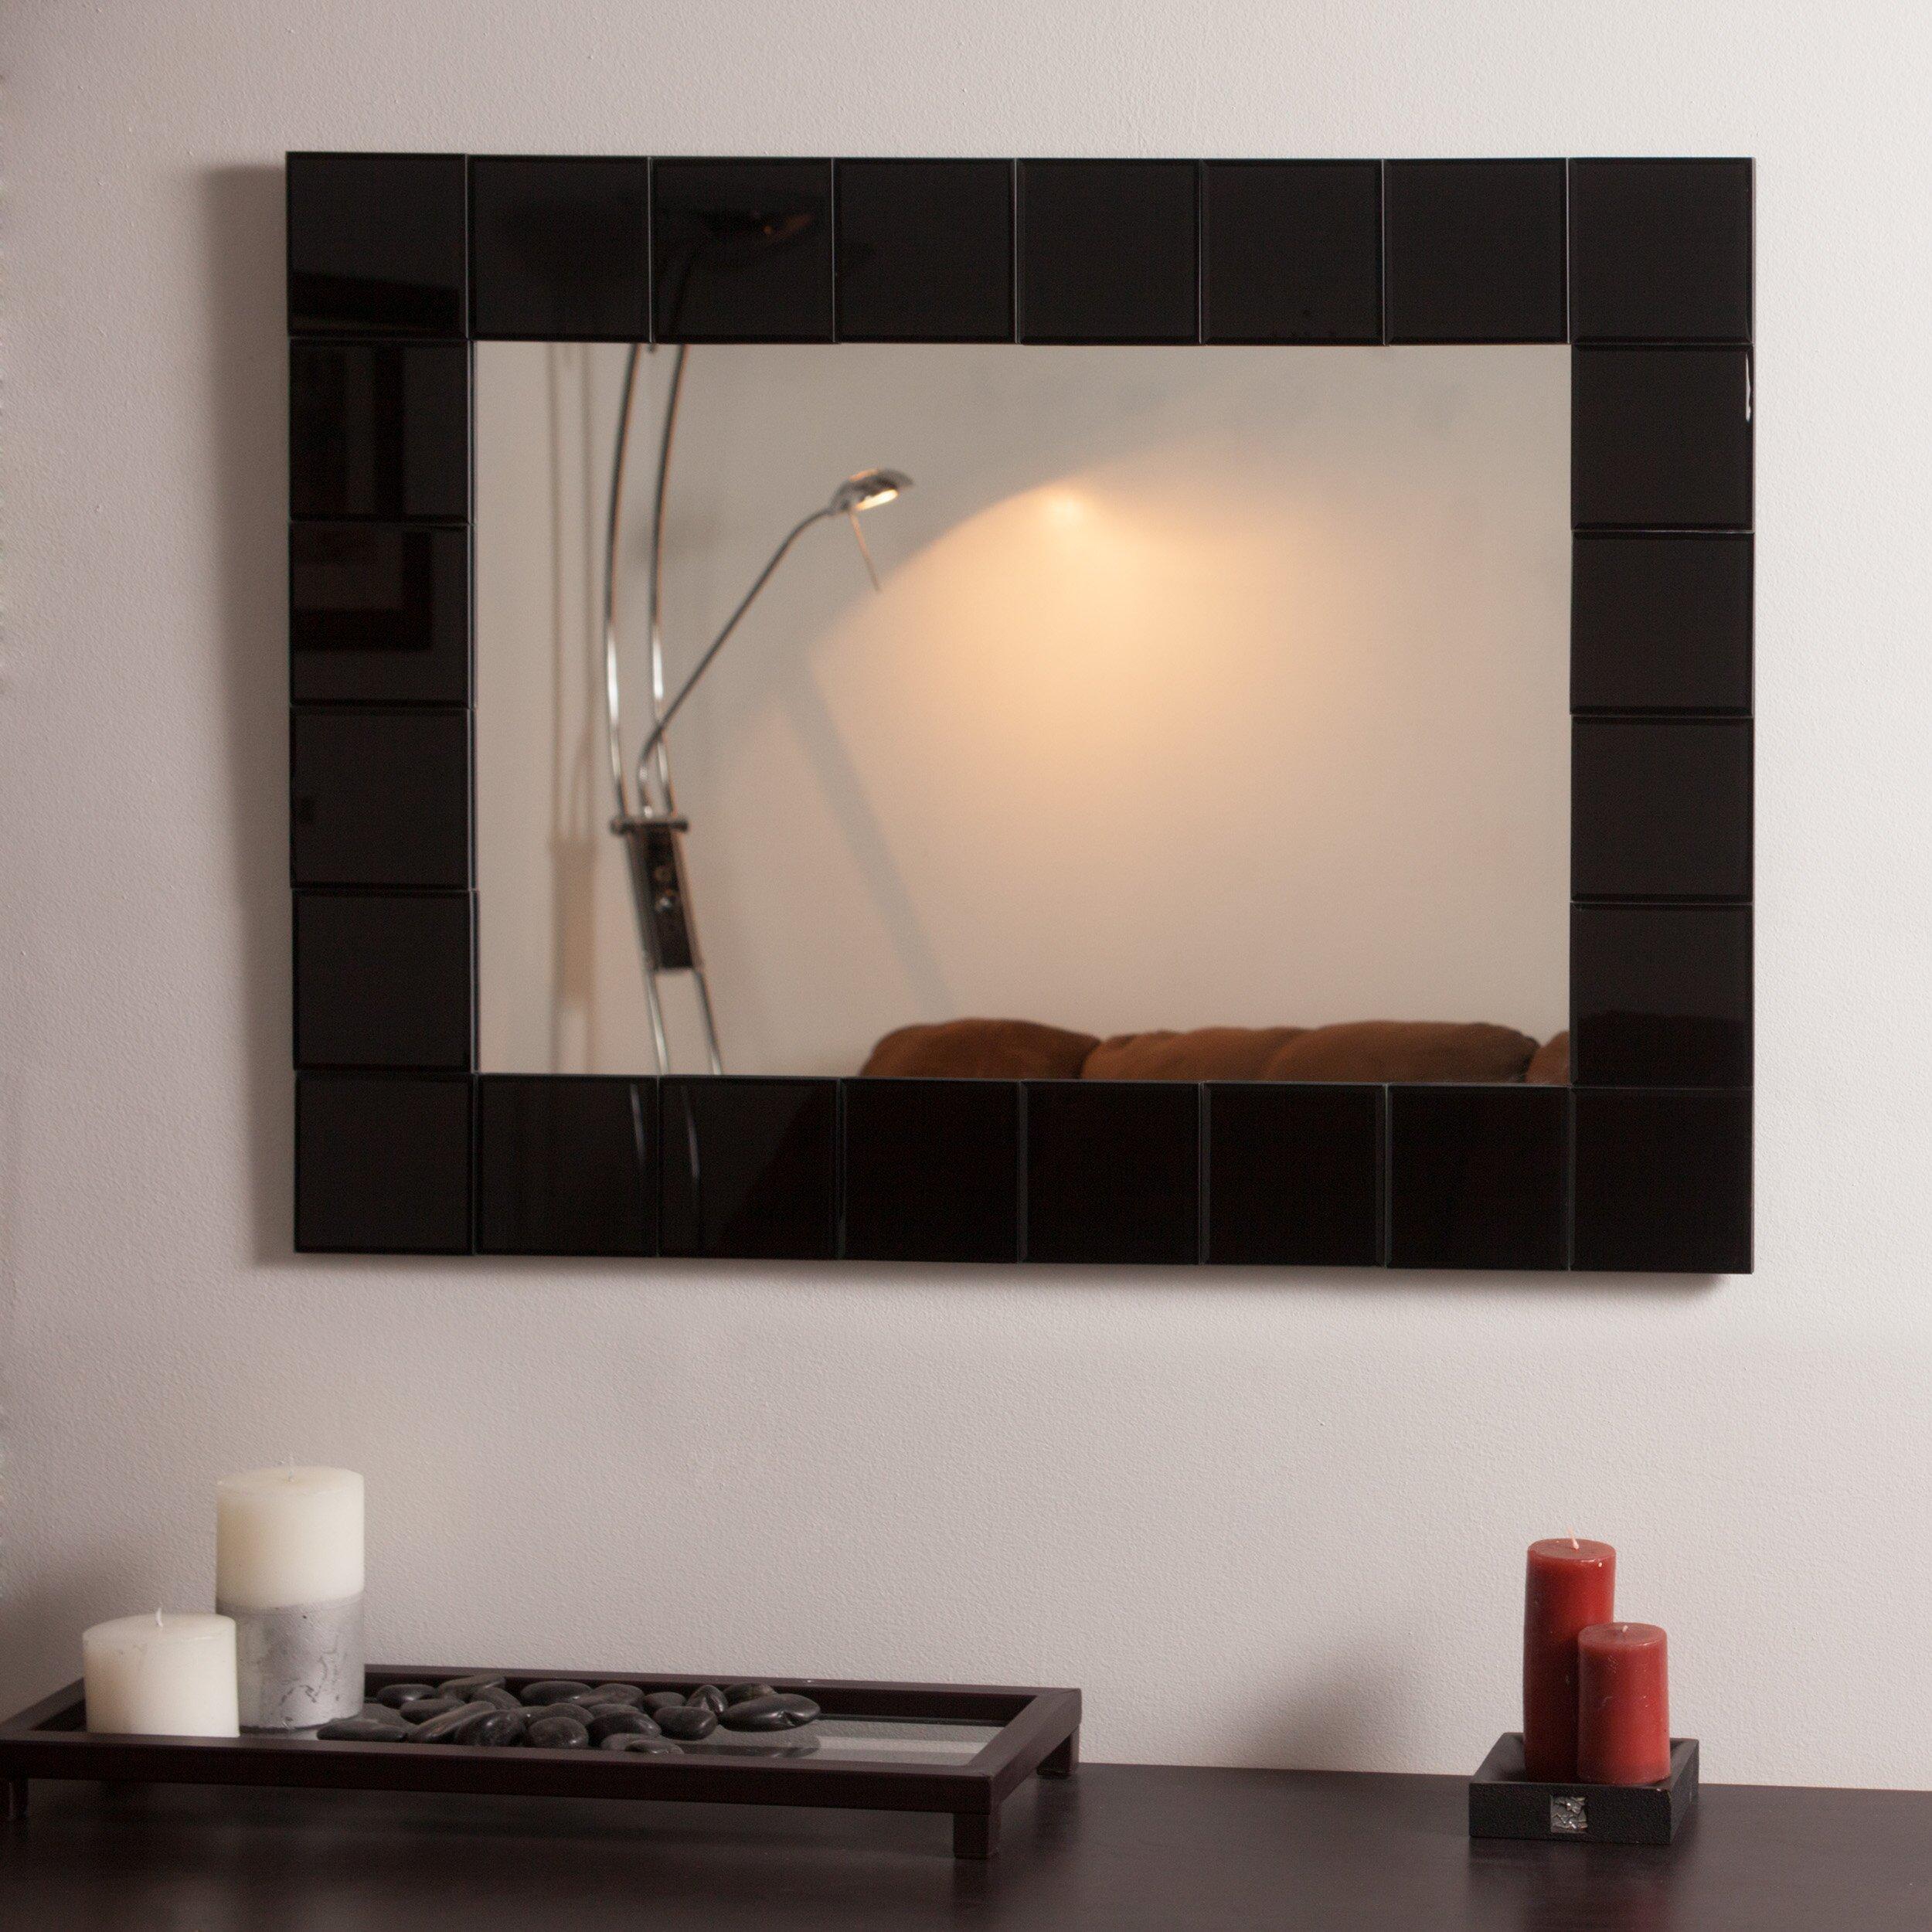 Decor Wonderland Montreal Modern Wall Mirror Reviews